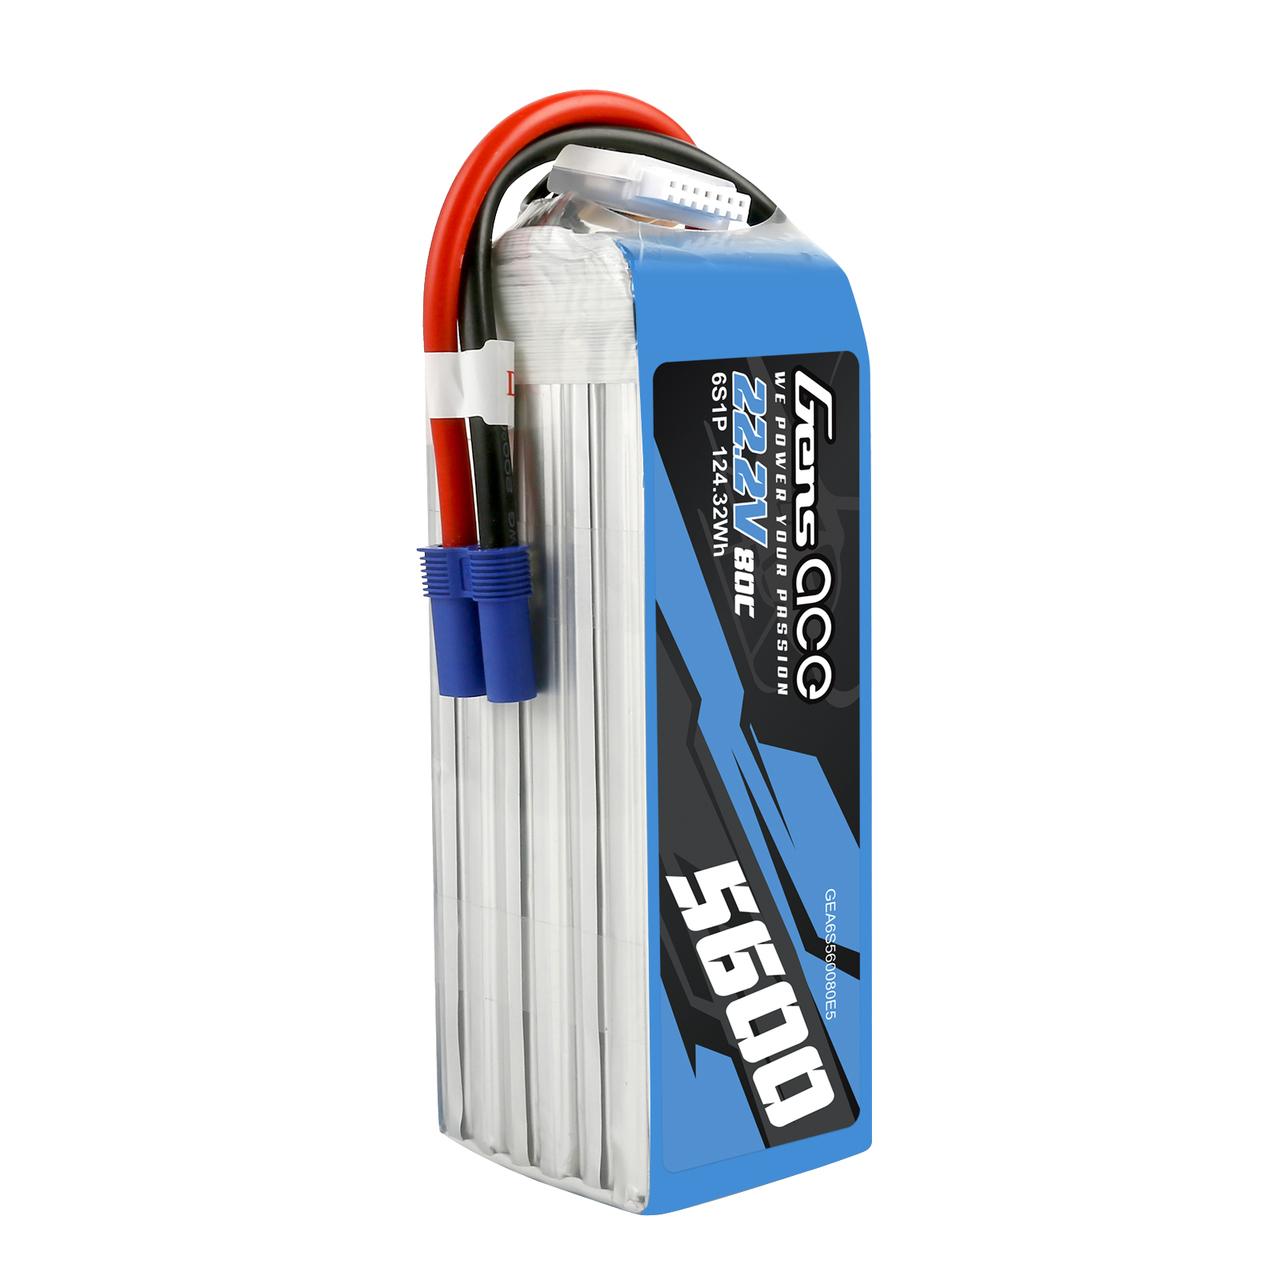 Gens ace  5600mAh 22.2V 80C 6SLipo Battery Pack with EC5 Plug